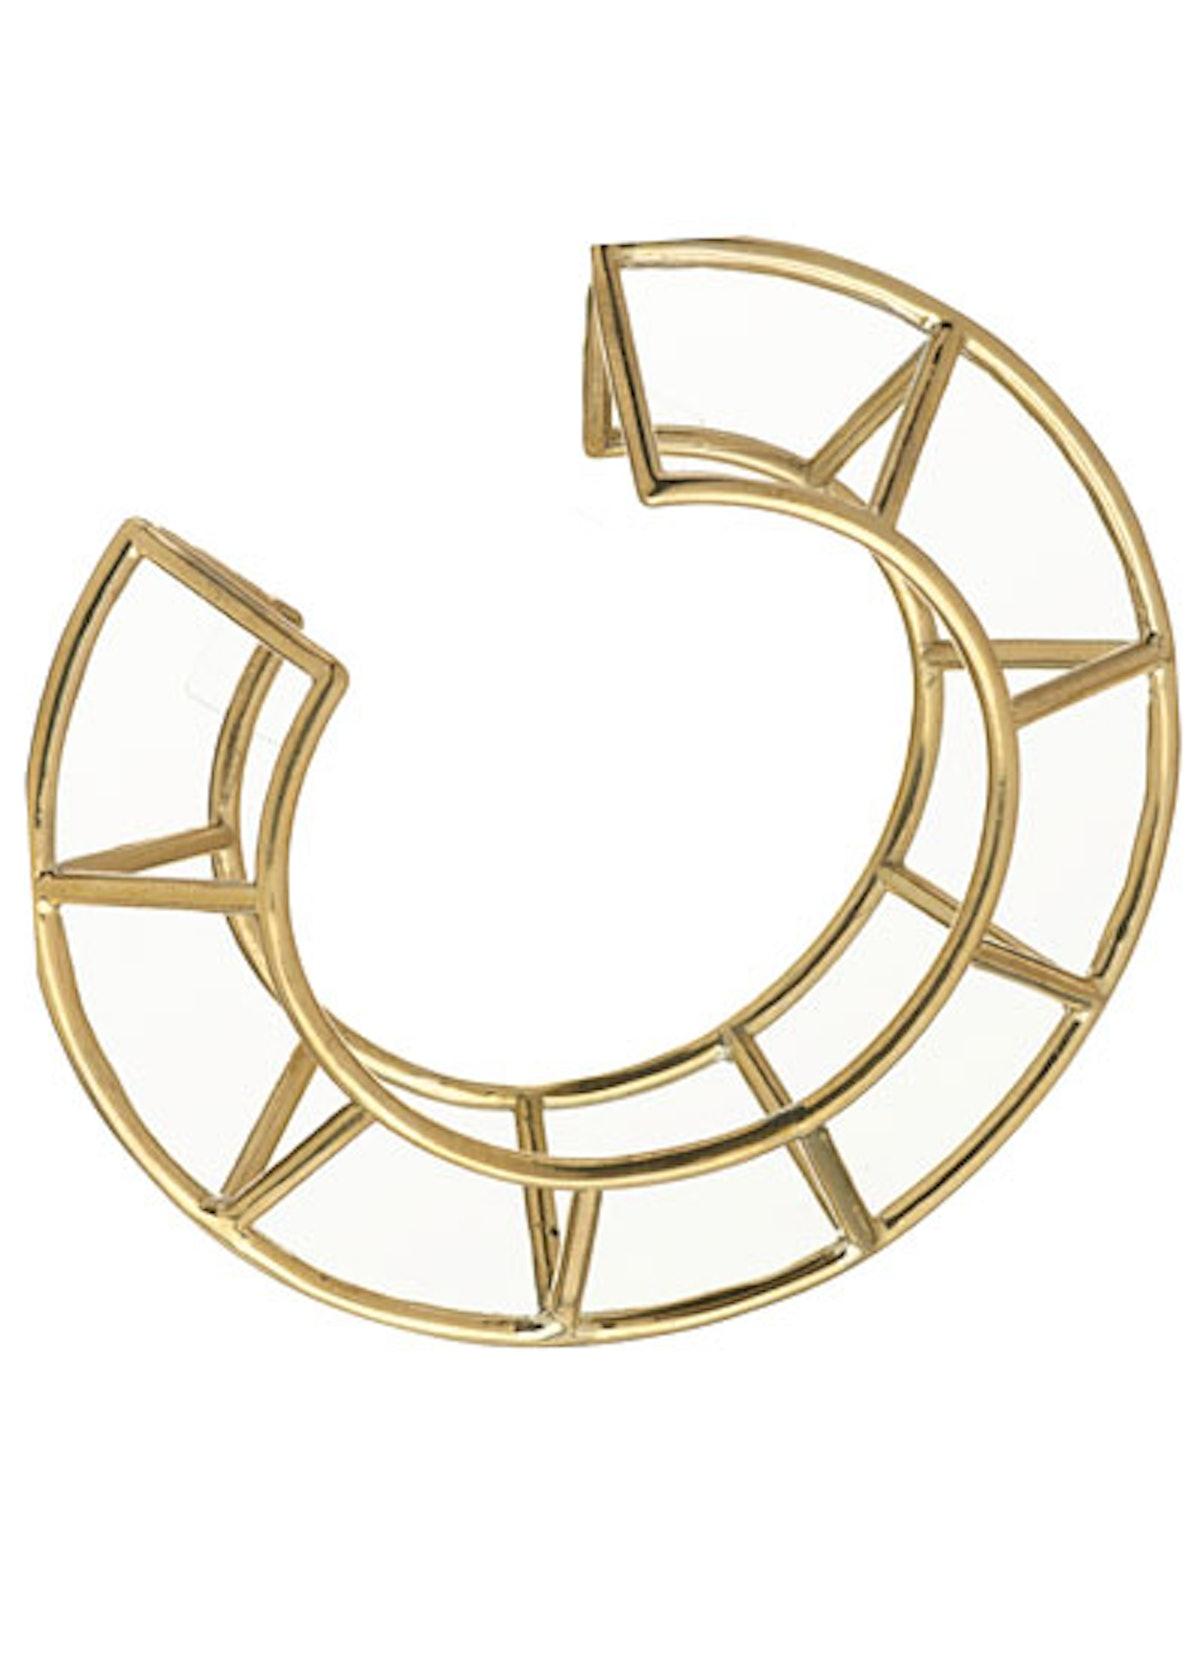 acss-gold-jewelry-05-v.jpg